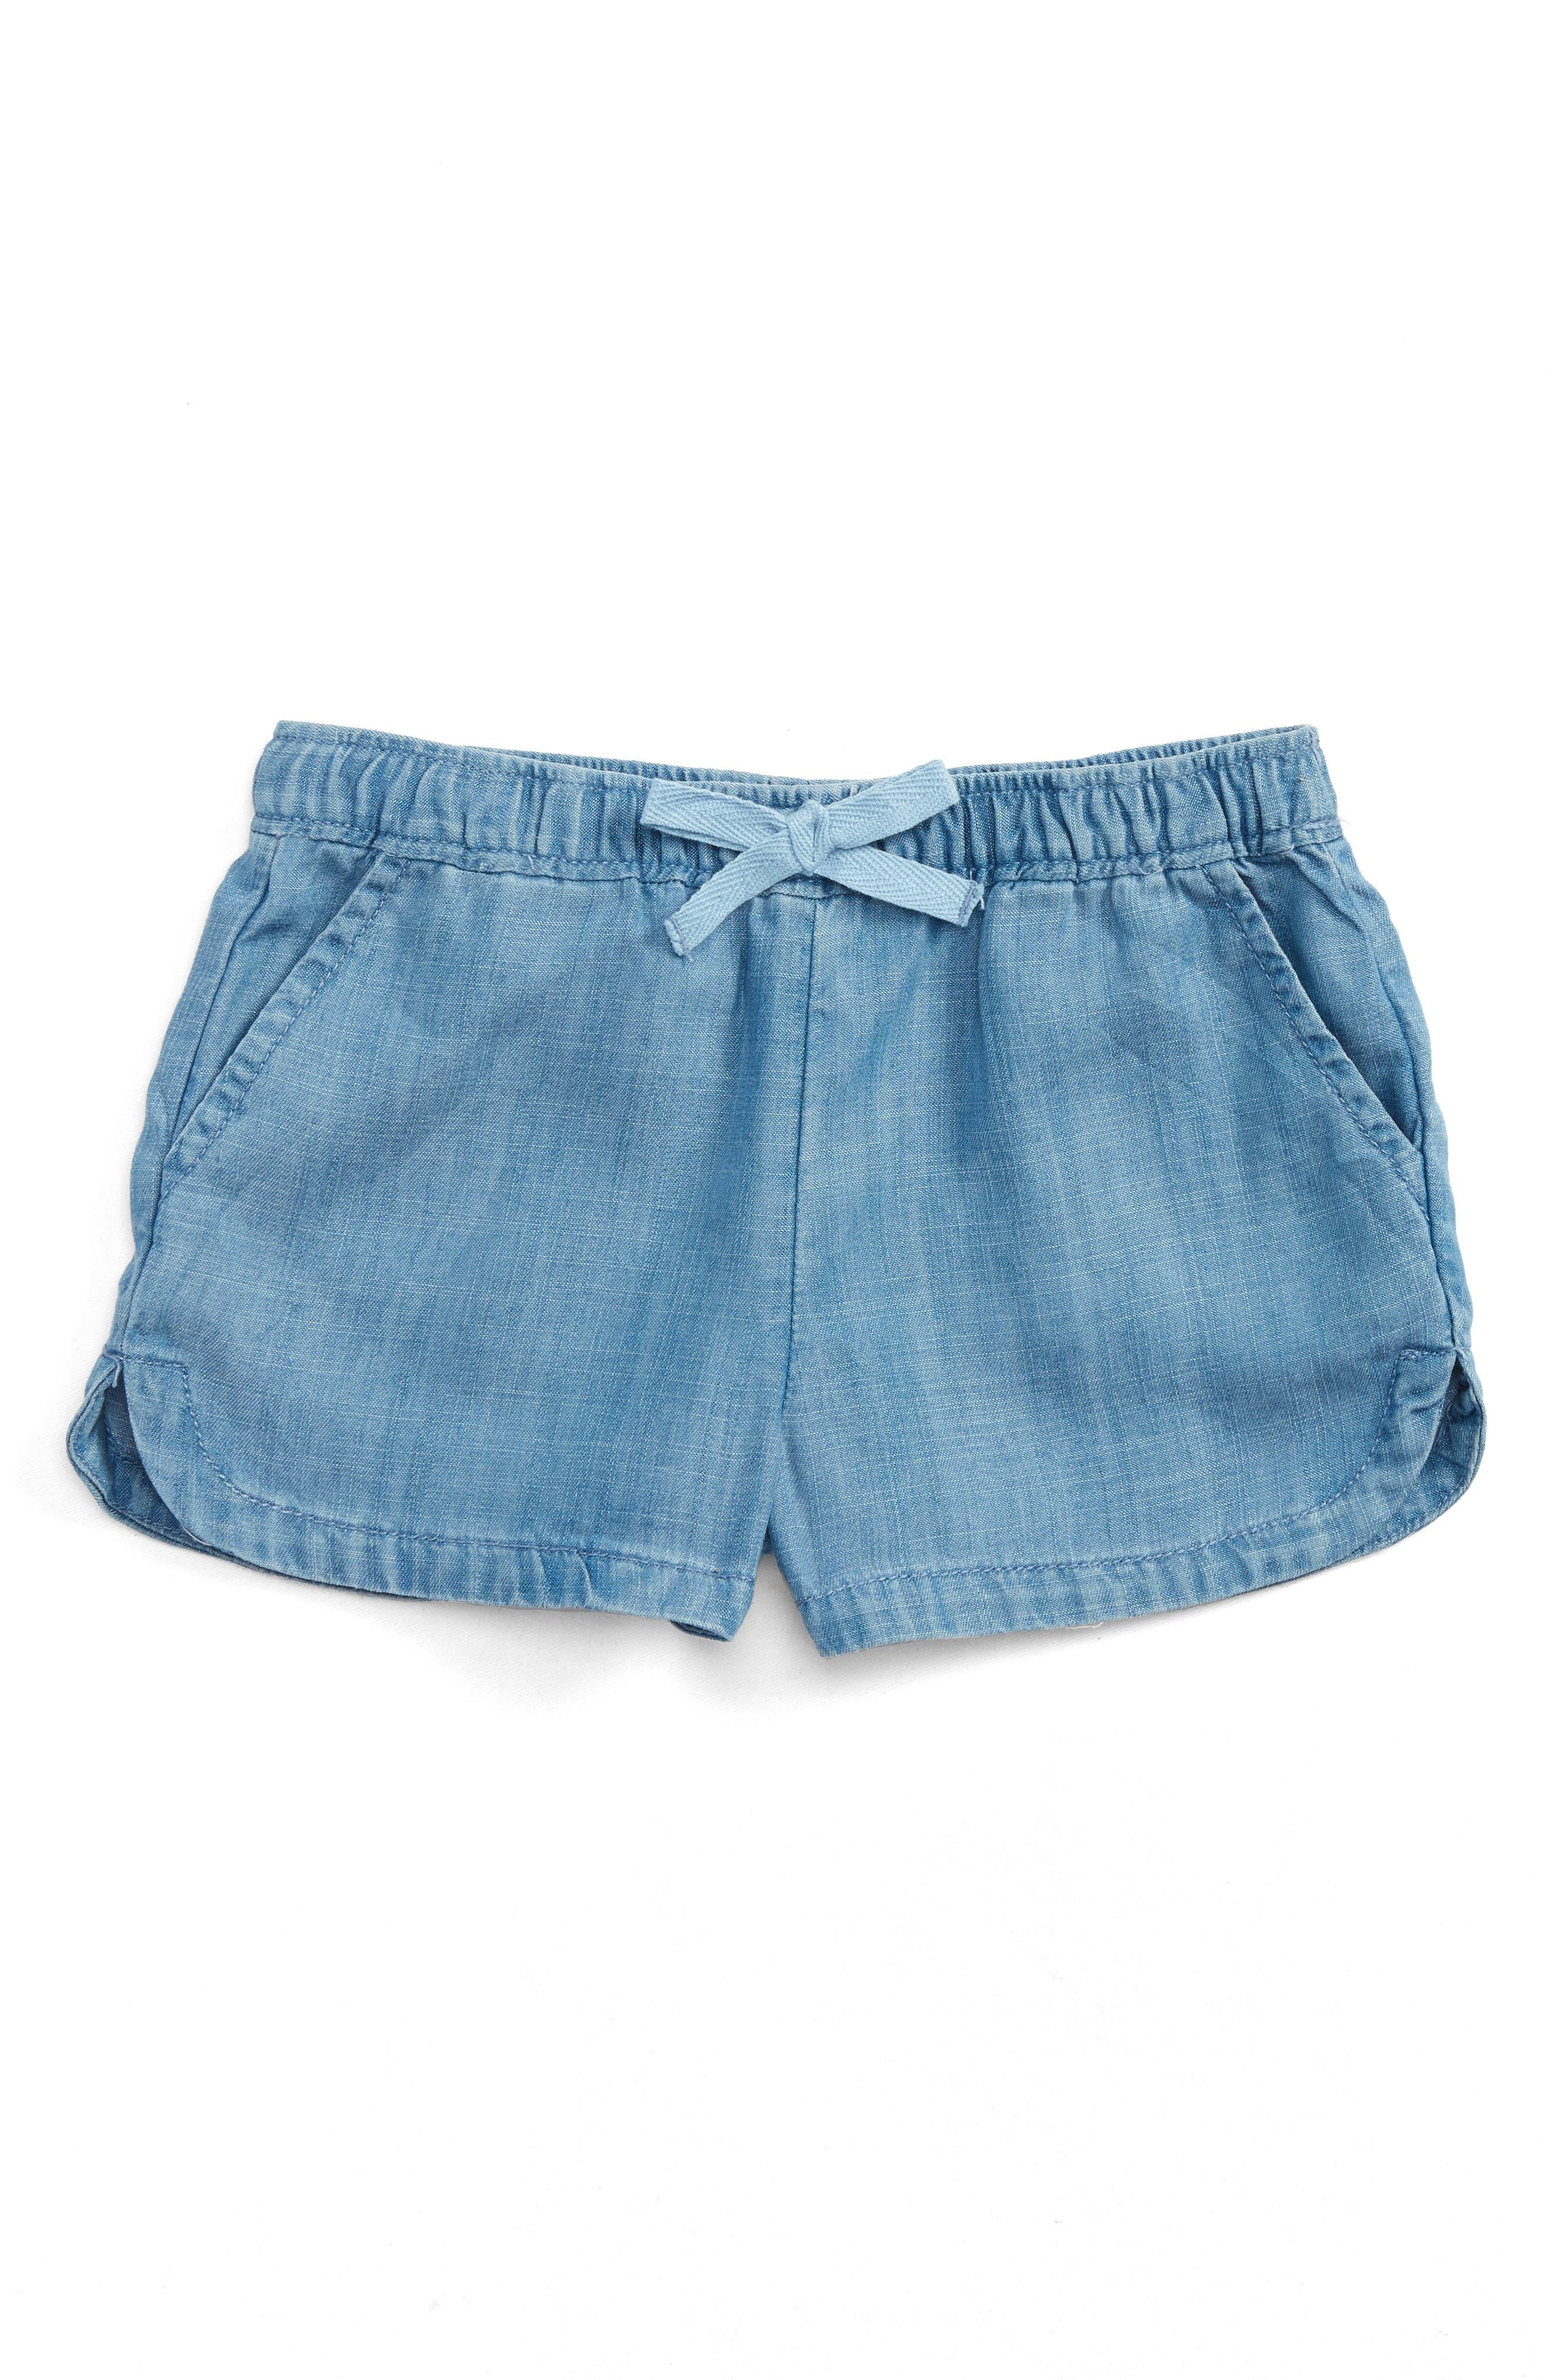 Vineyard Vines Chambray Pull-On Shorts (Toddler Girls)